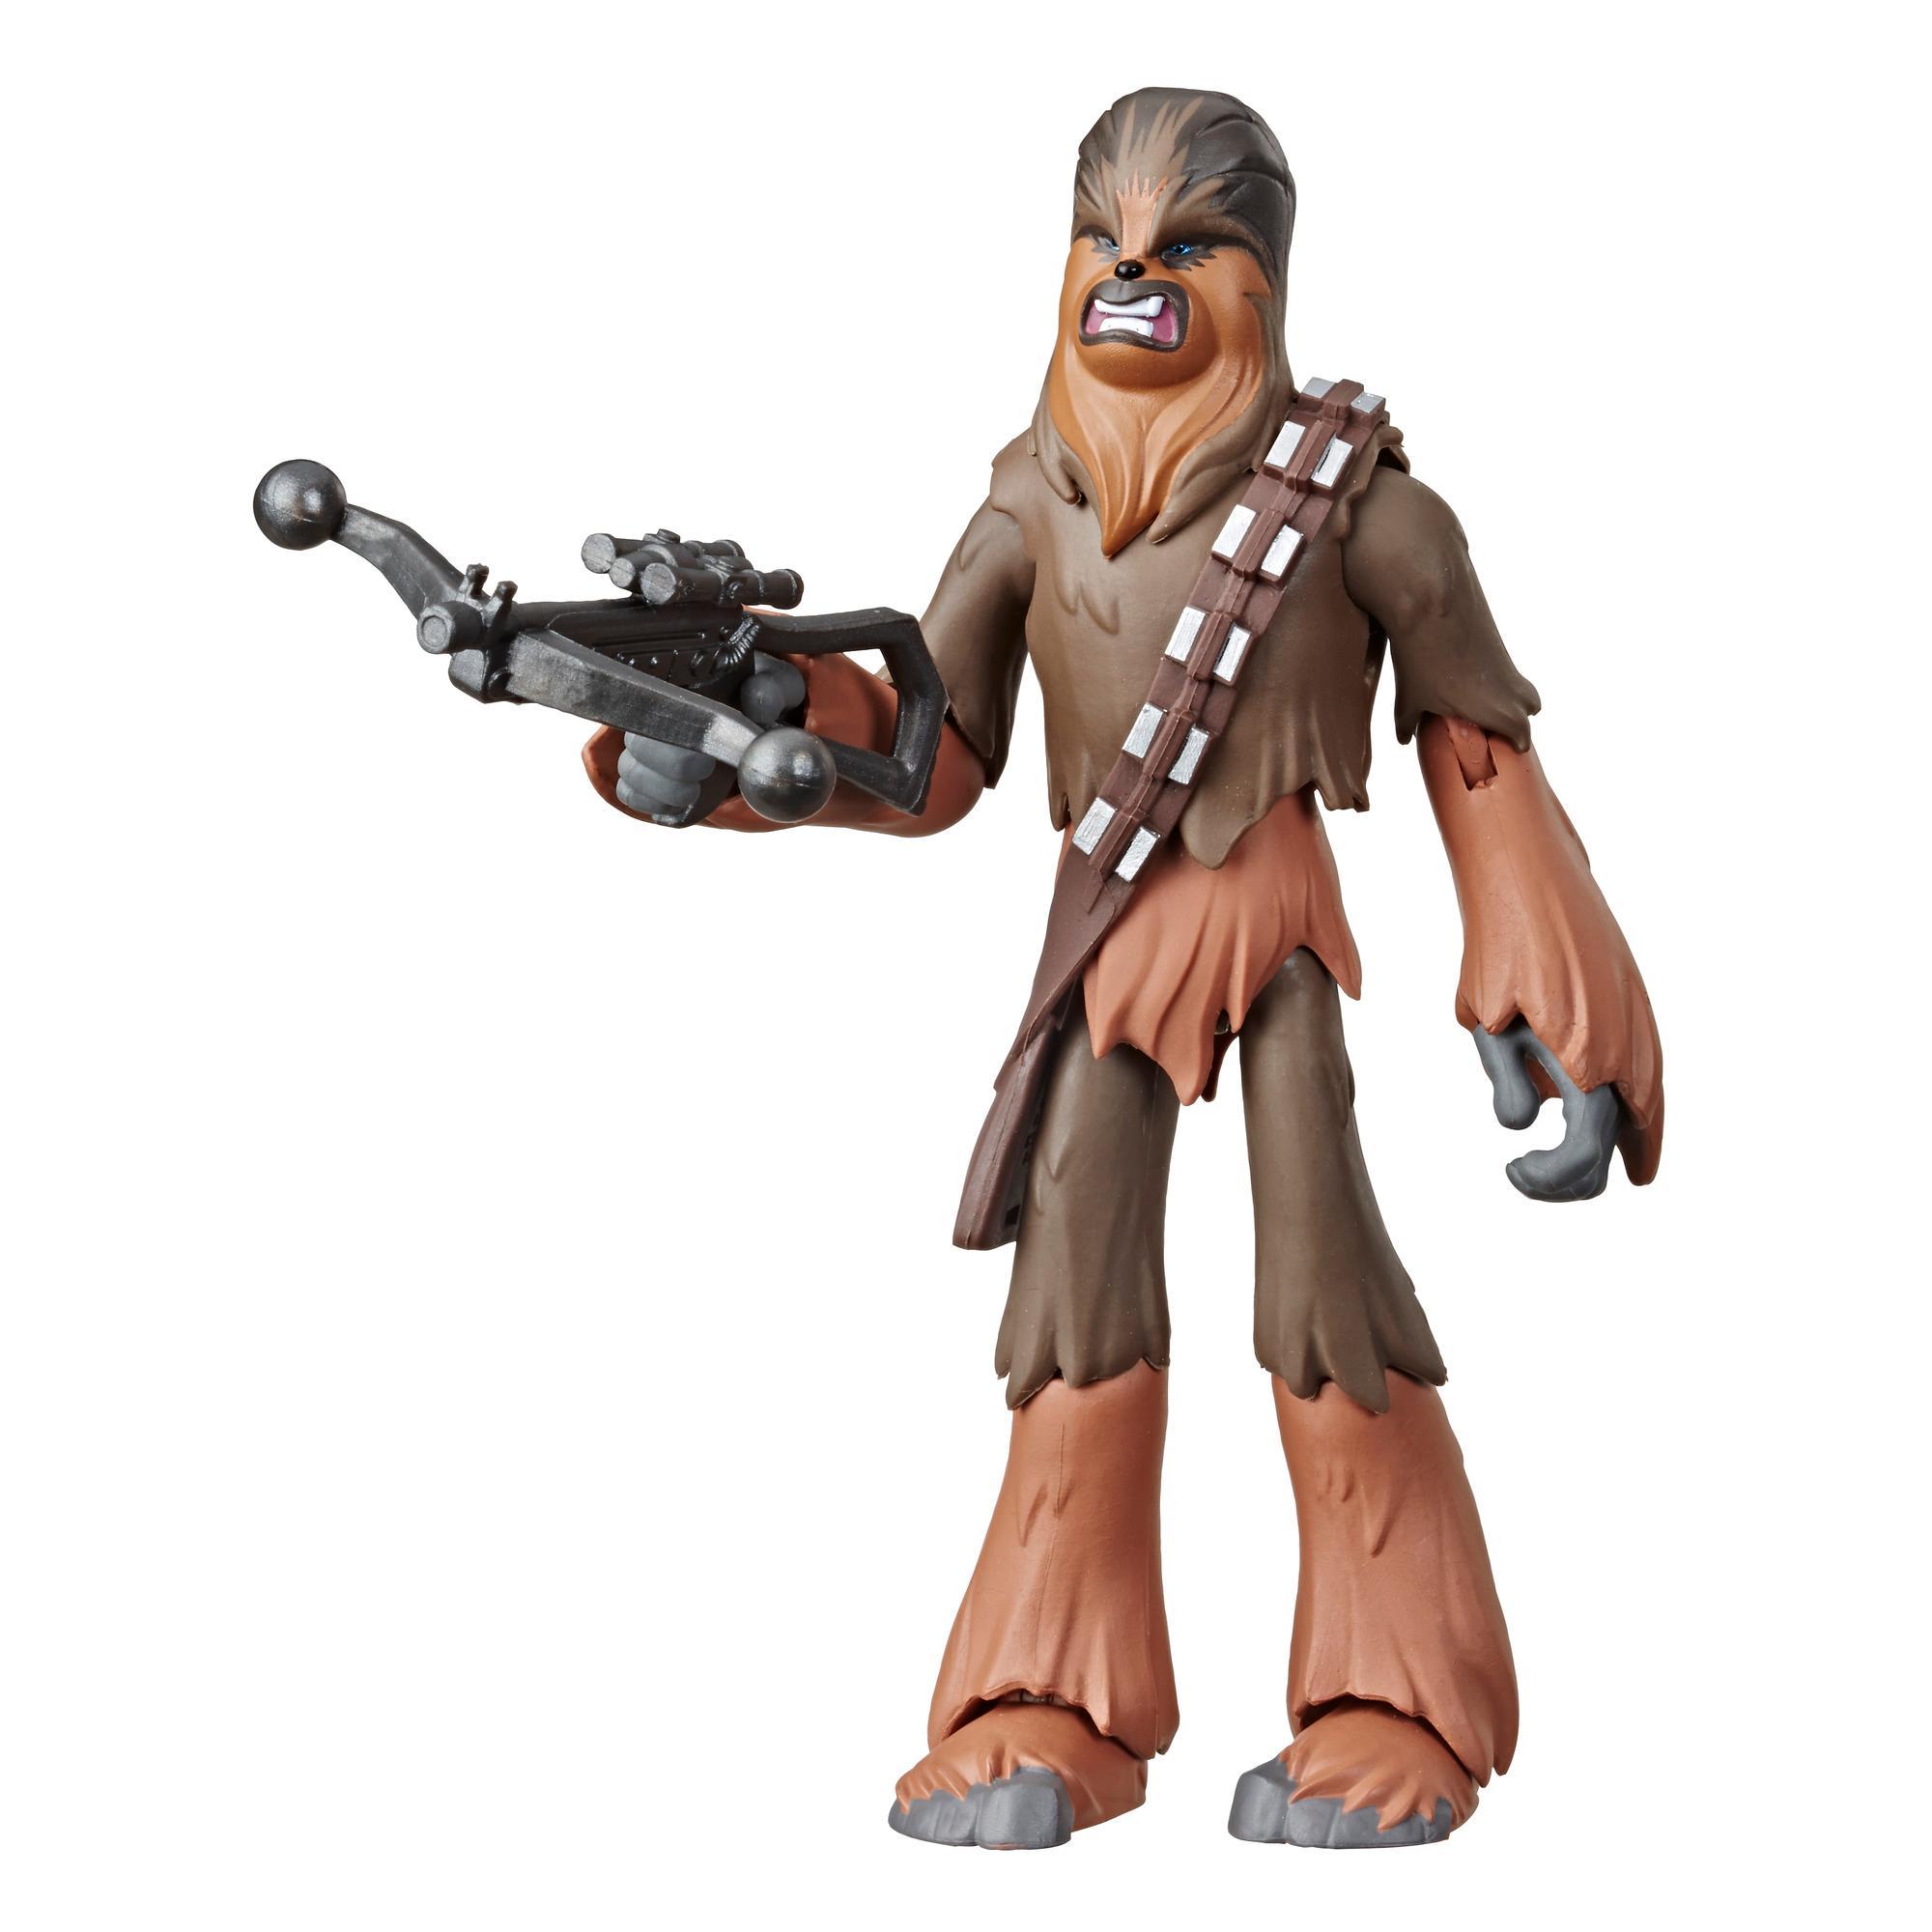 Star Wars Galaxy of Adventures Chewbacca Action-Figur